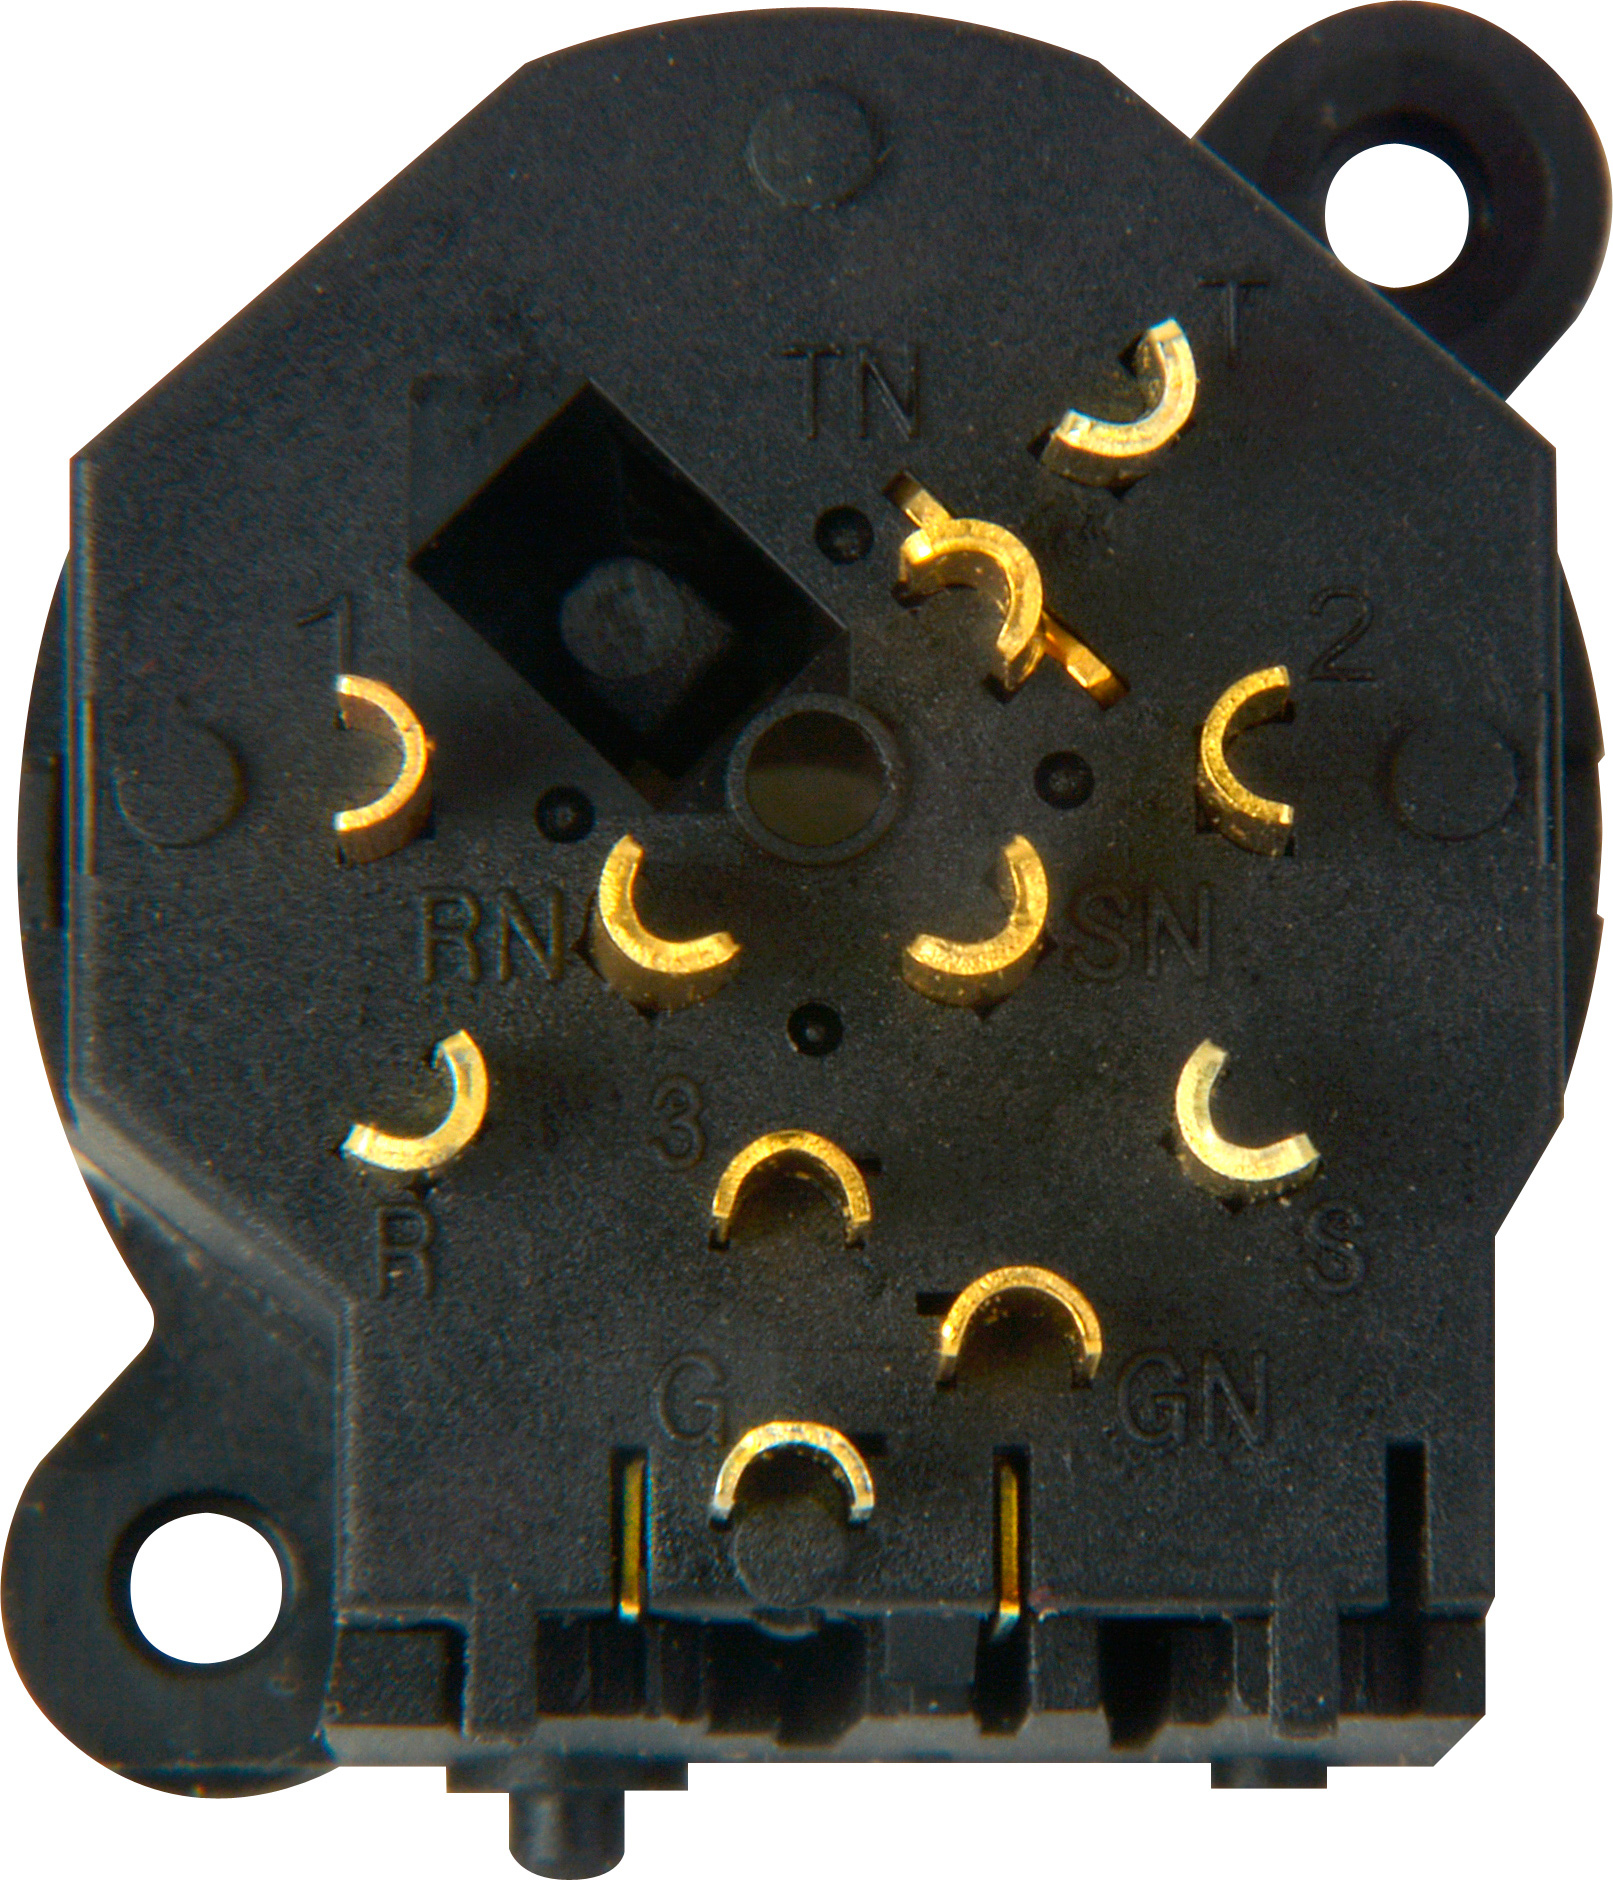 neutrik ncj10fi s combo 3 pin xlr 1 4 inch stereo w. Black Bedroom Furniture Sets. Home Design Ideas